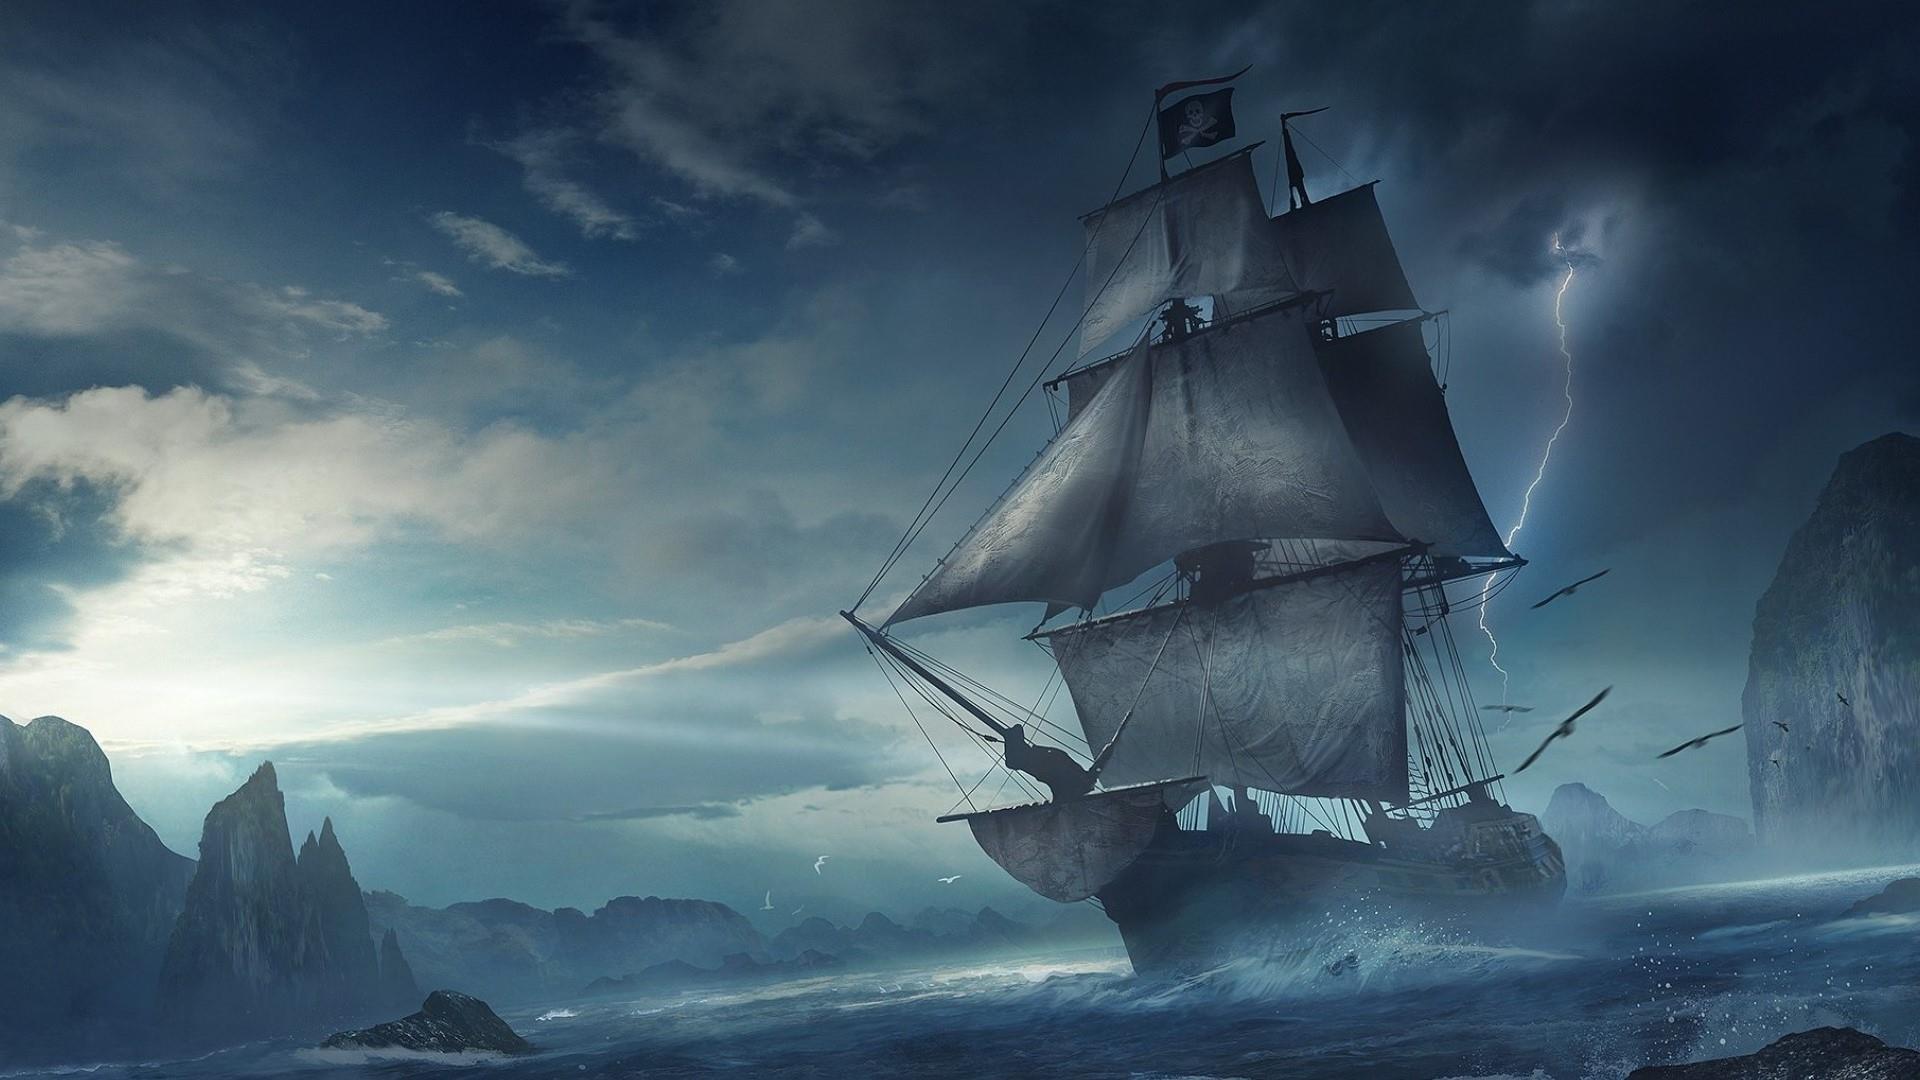 ☠ Pirate Ship At Sea - Fantasy Art Wallpaper | Wallpaper Studio ...